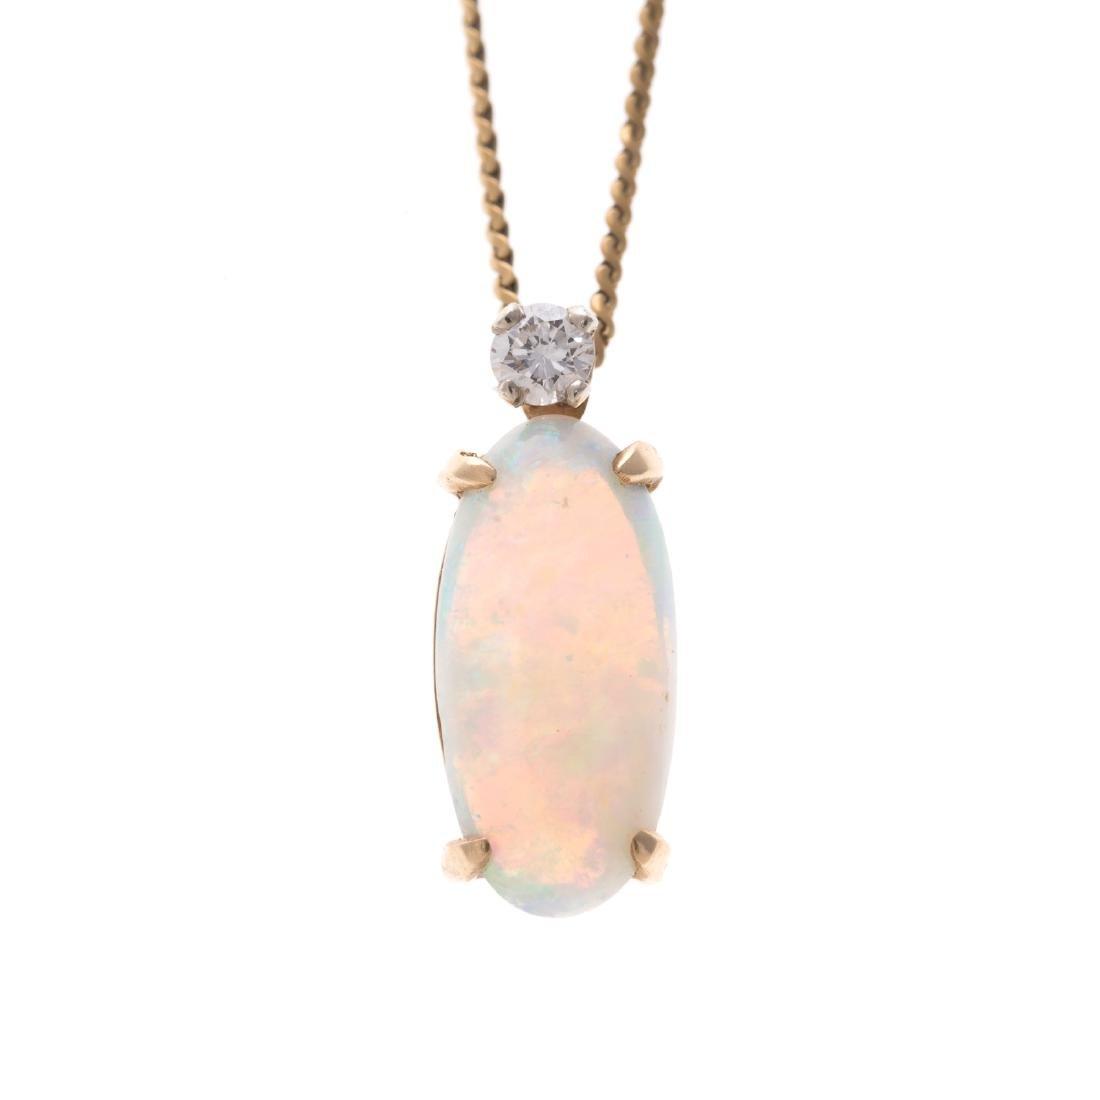 A Lady's 18K Opal and Diamond Pendant